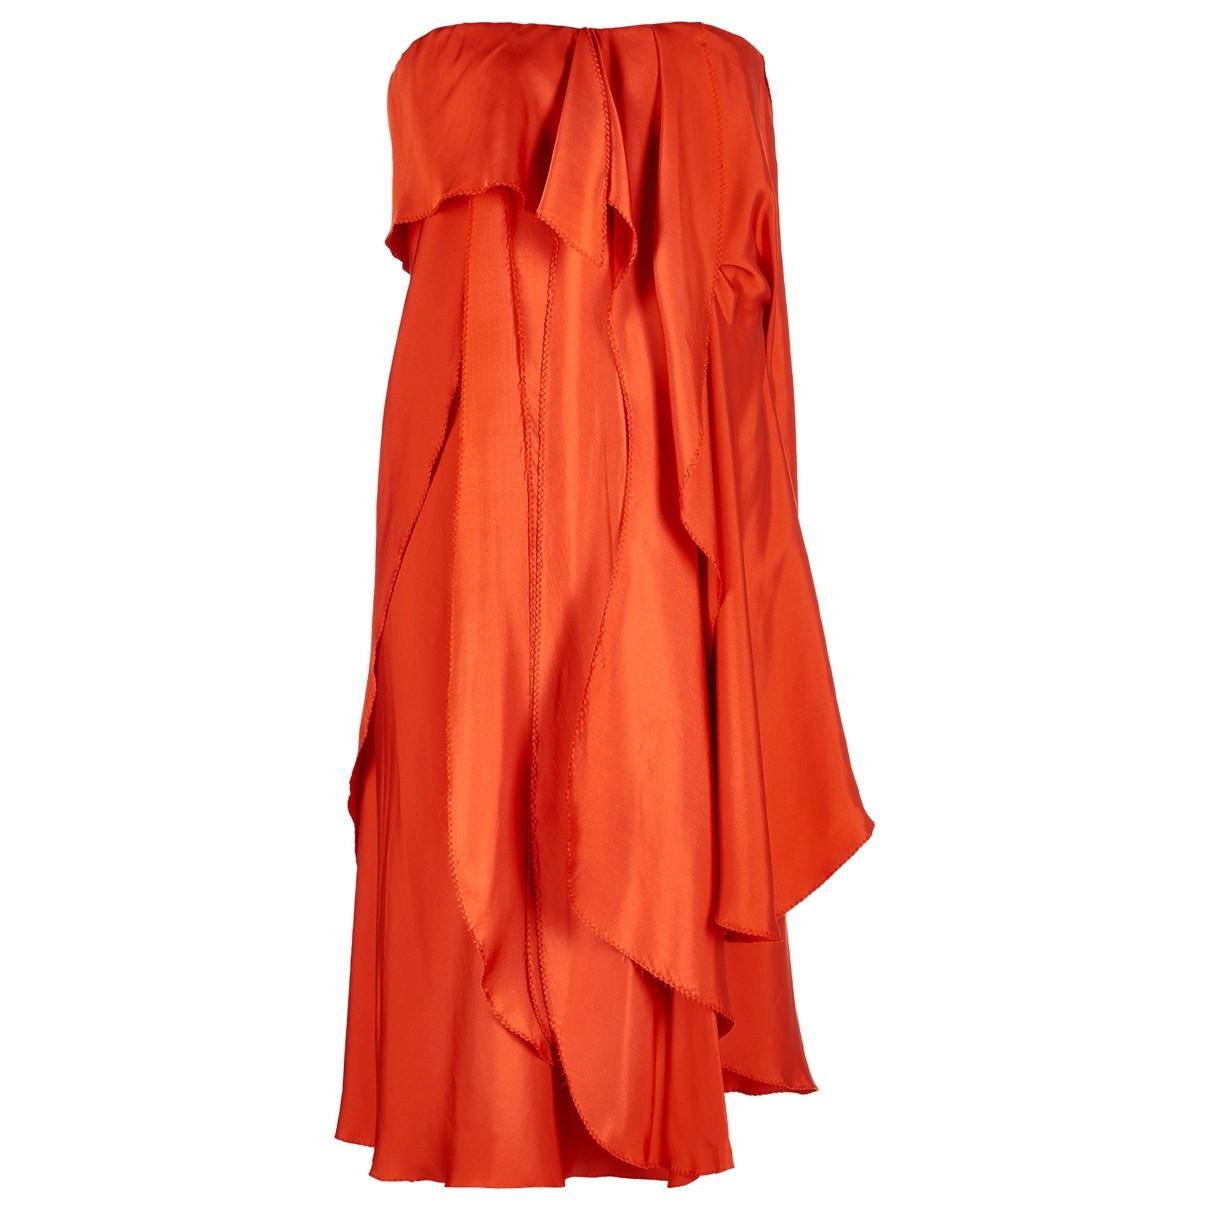 Bottega Veneta \N Kleid in  Orange Seide